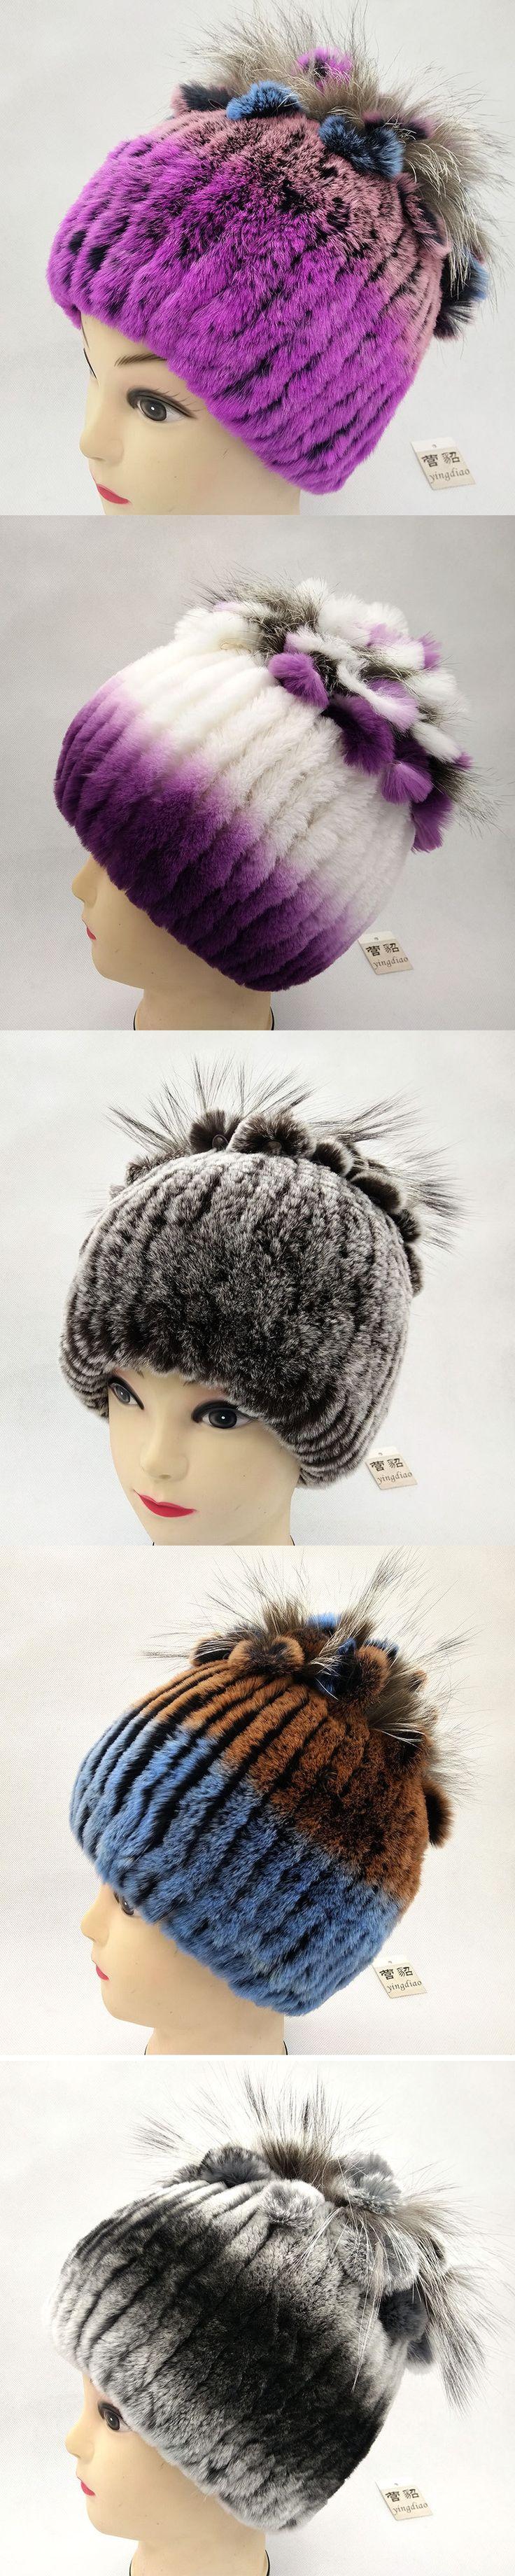 Winter fur hat for women real rex rabbit fur hat with silver fox fur flower knitted beanies 2017 new sale high-end women fur cap